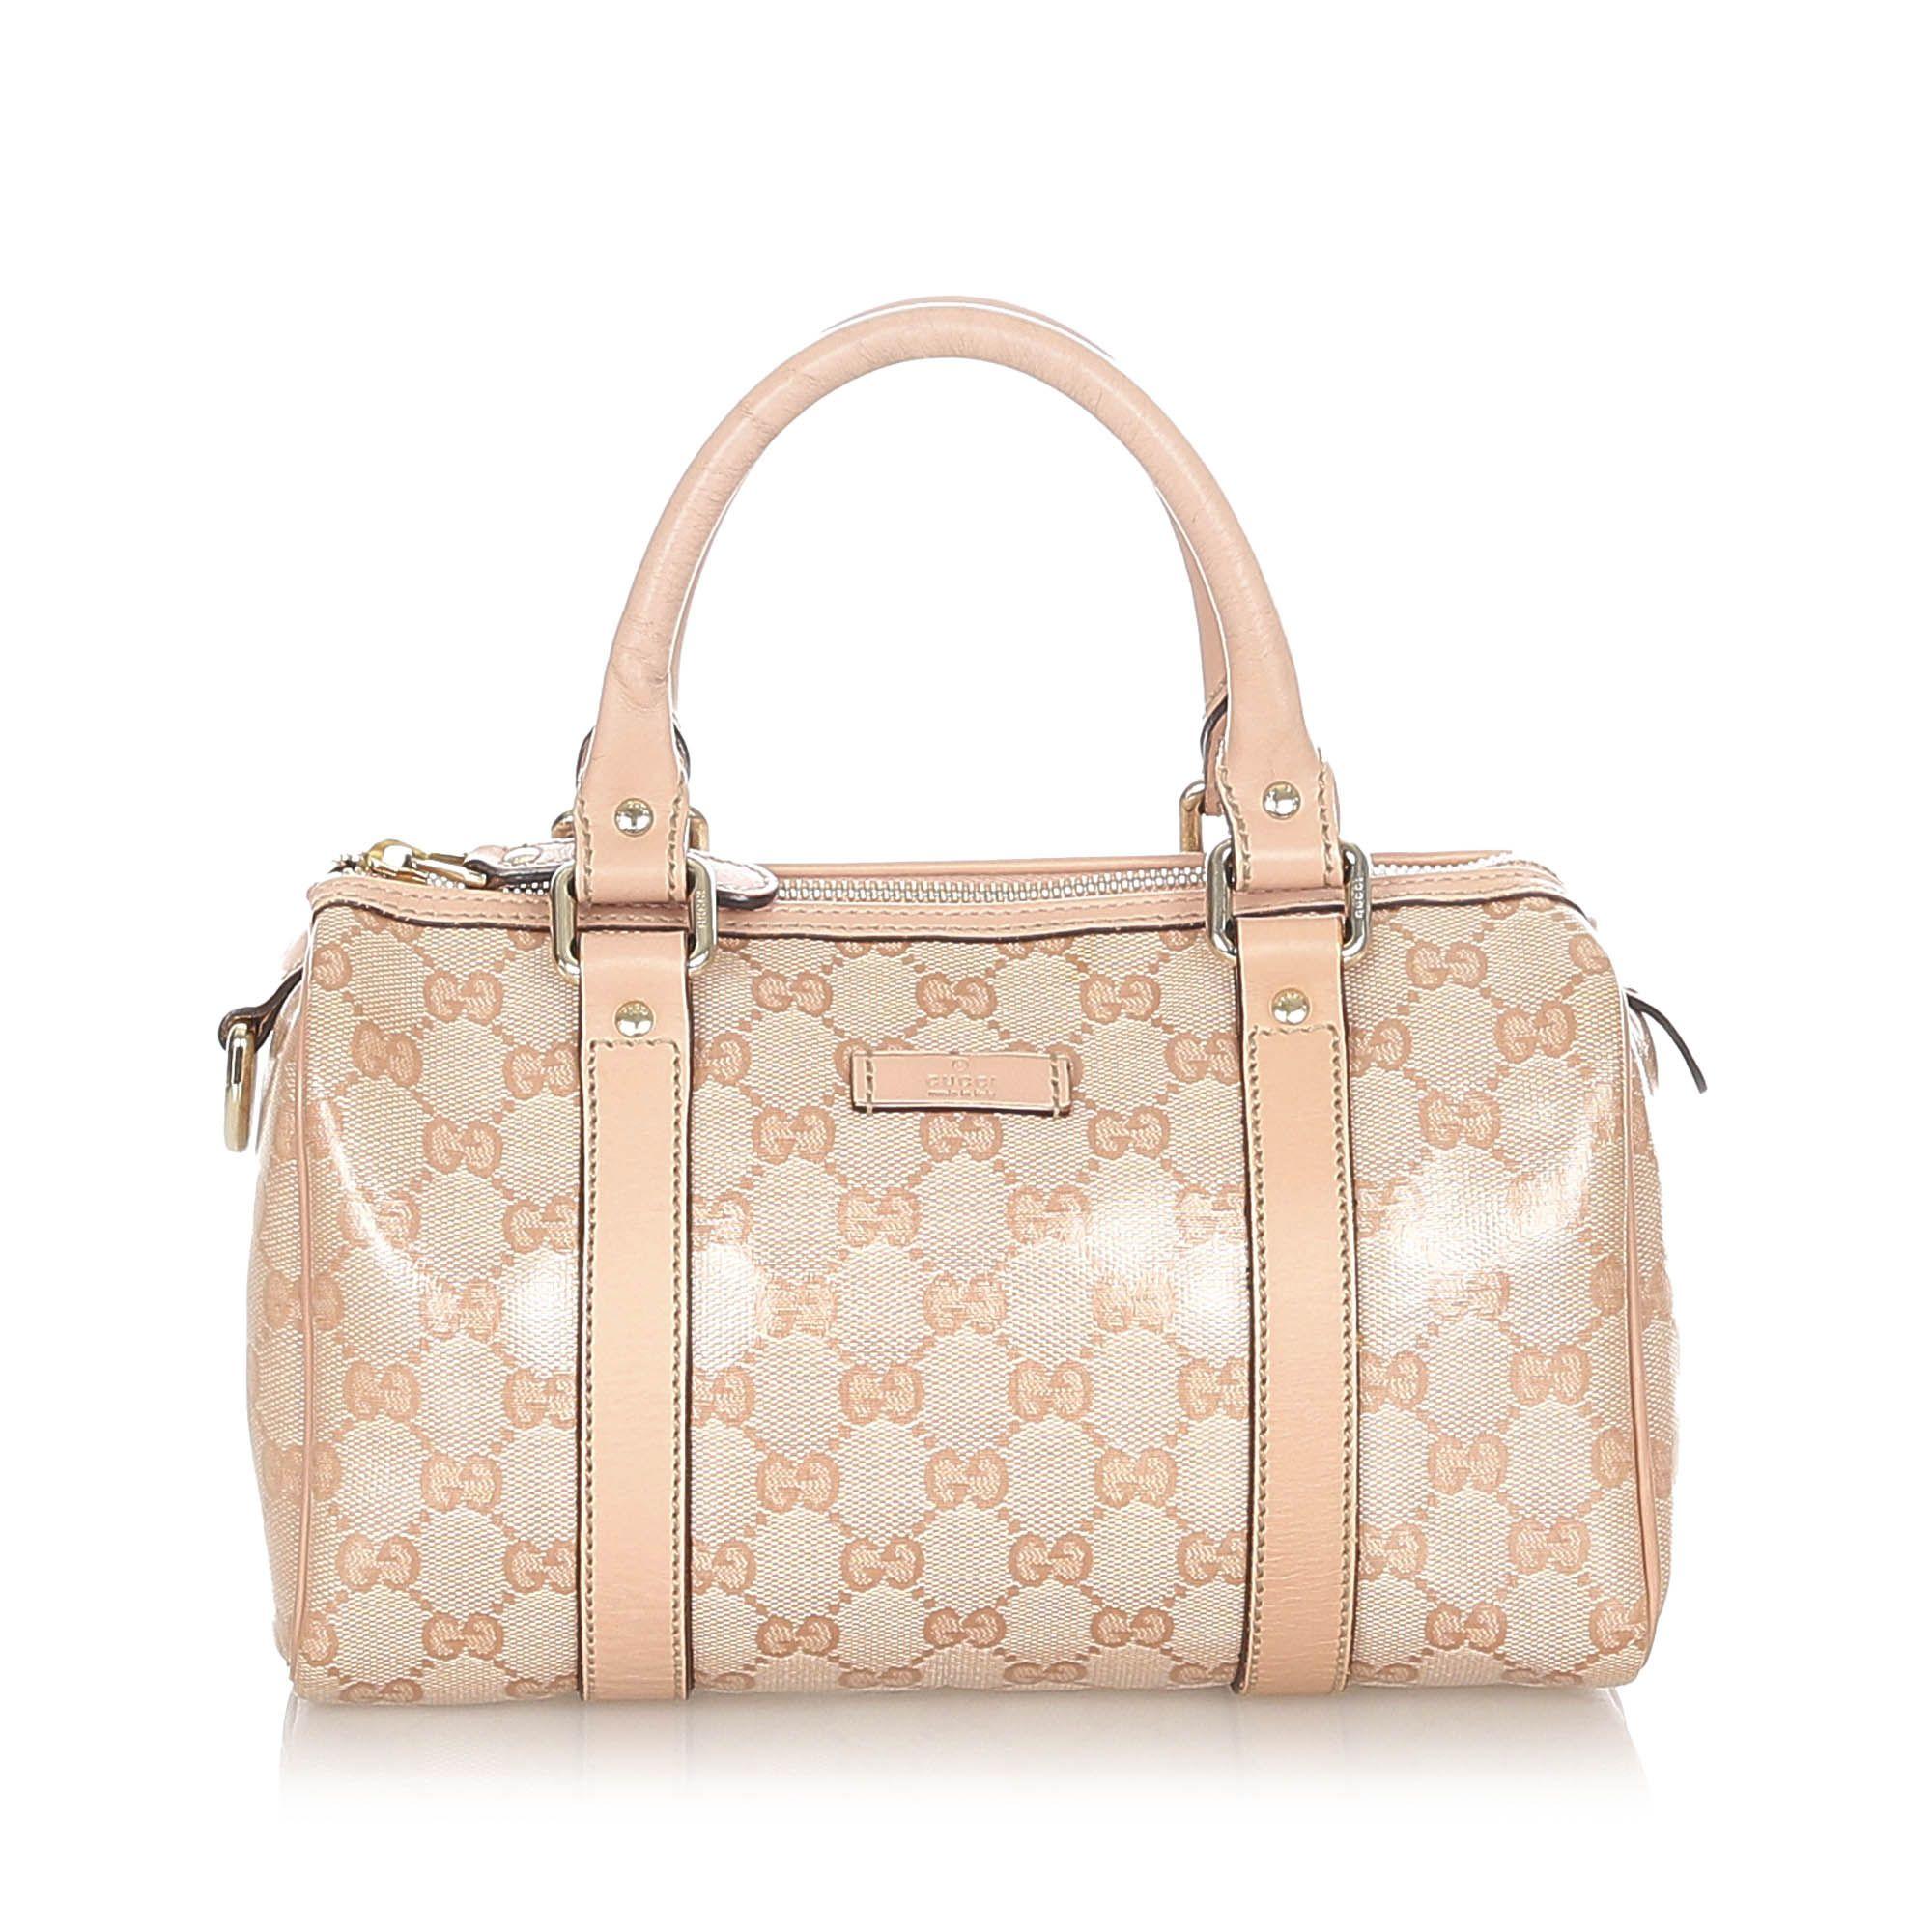 Vintage Gucci GG Crystal Joy Boston Bag Pink